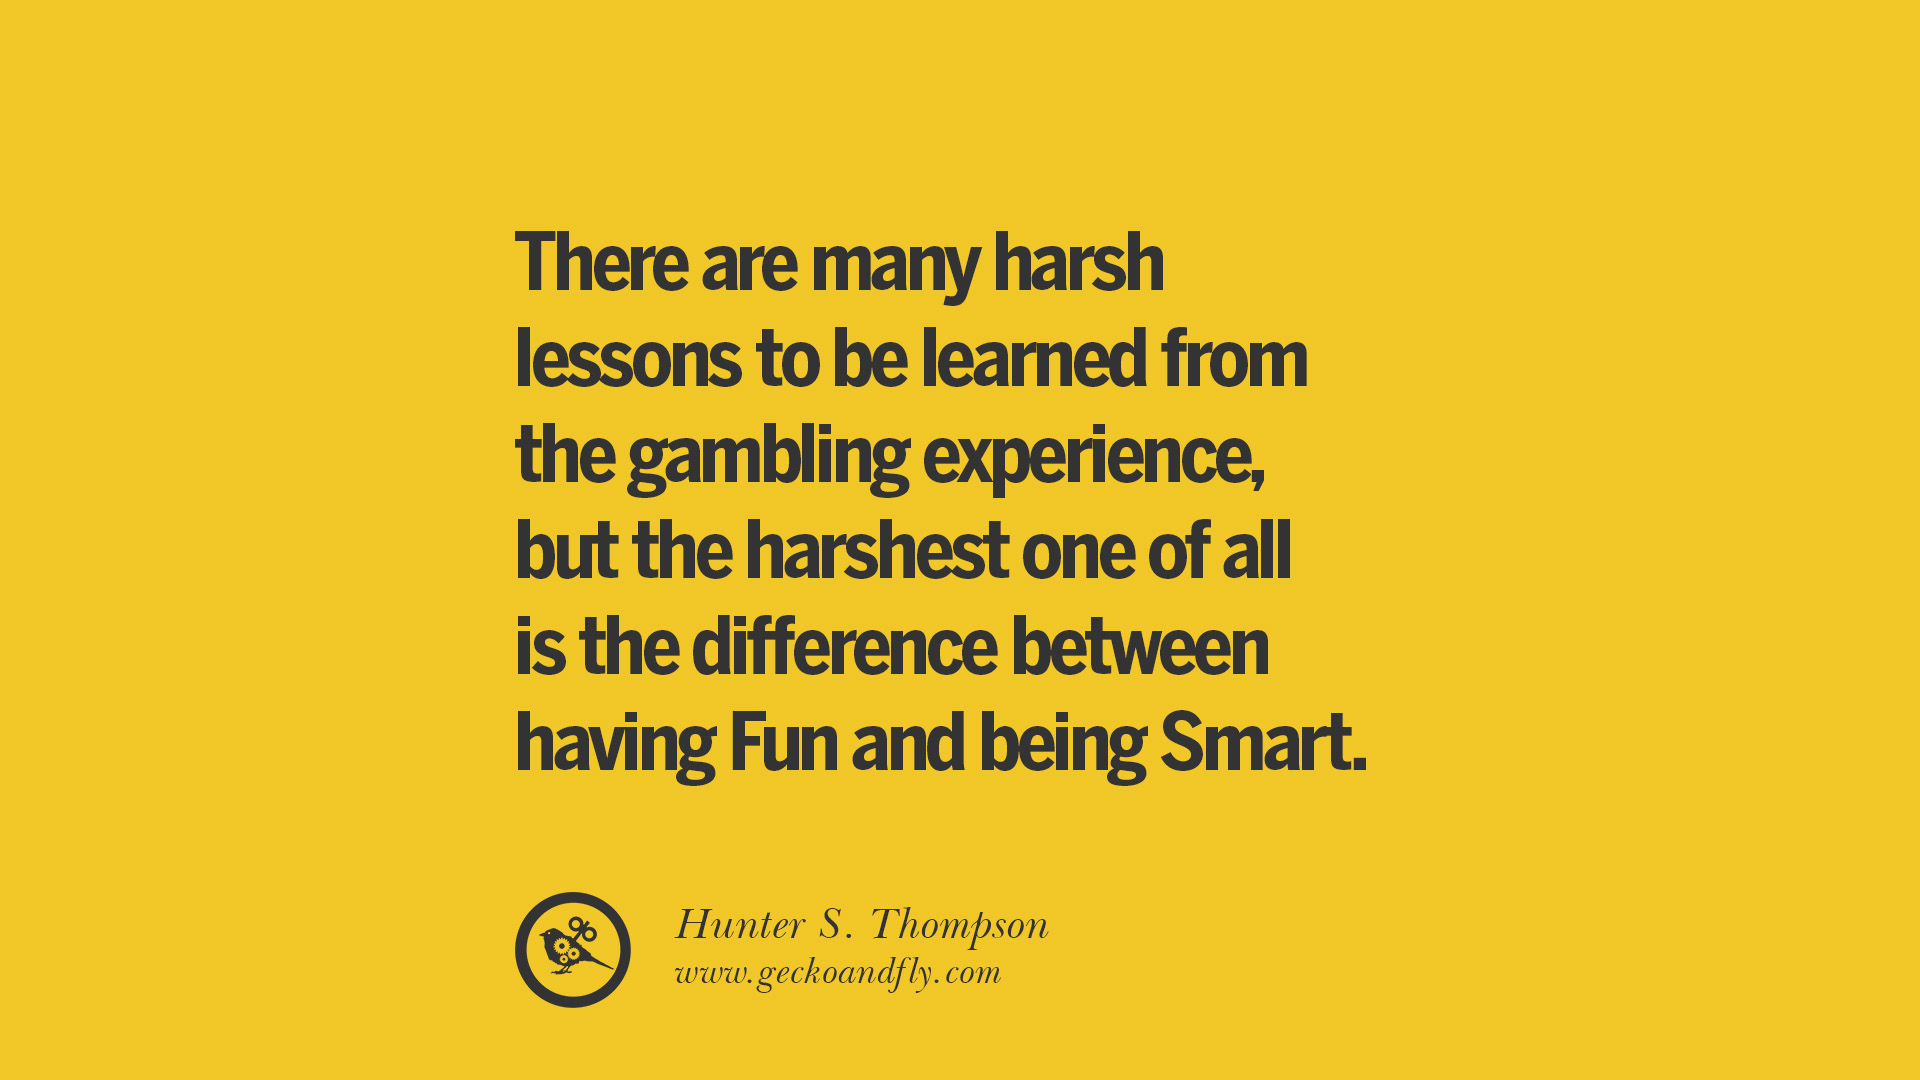 Gambling Quotes And Sayings